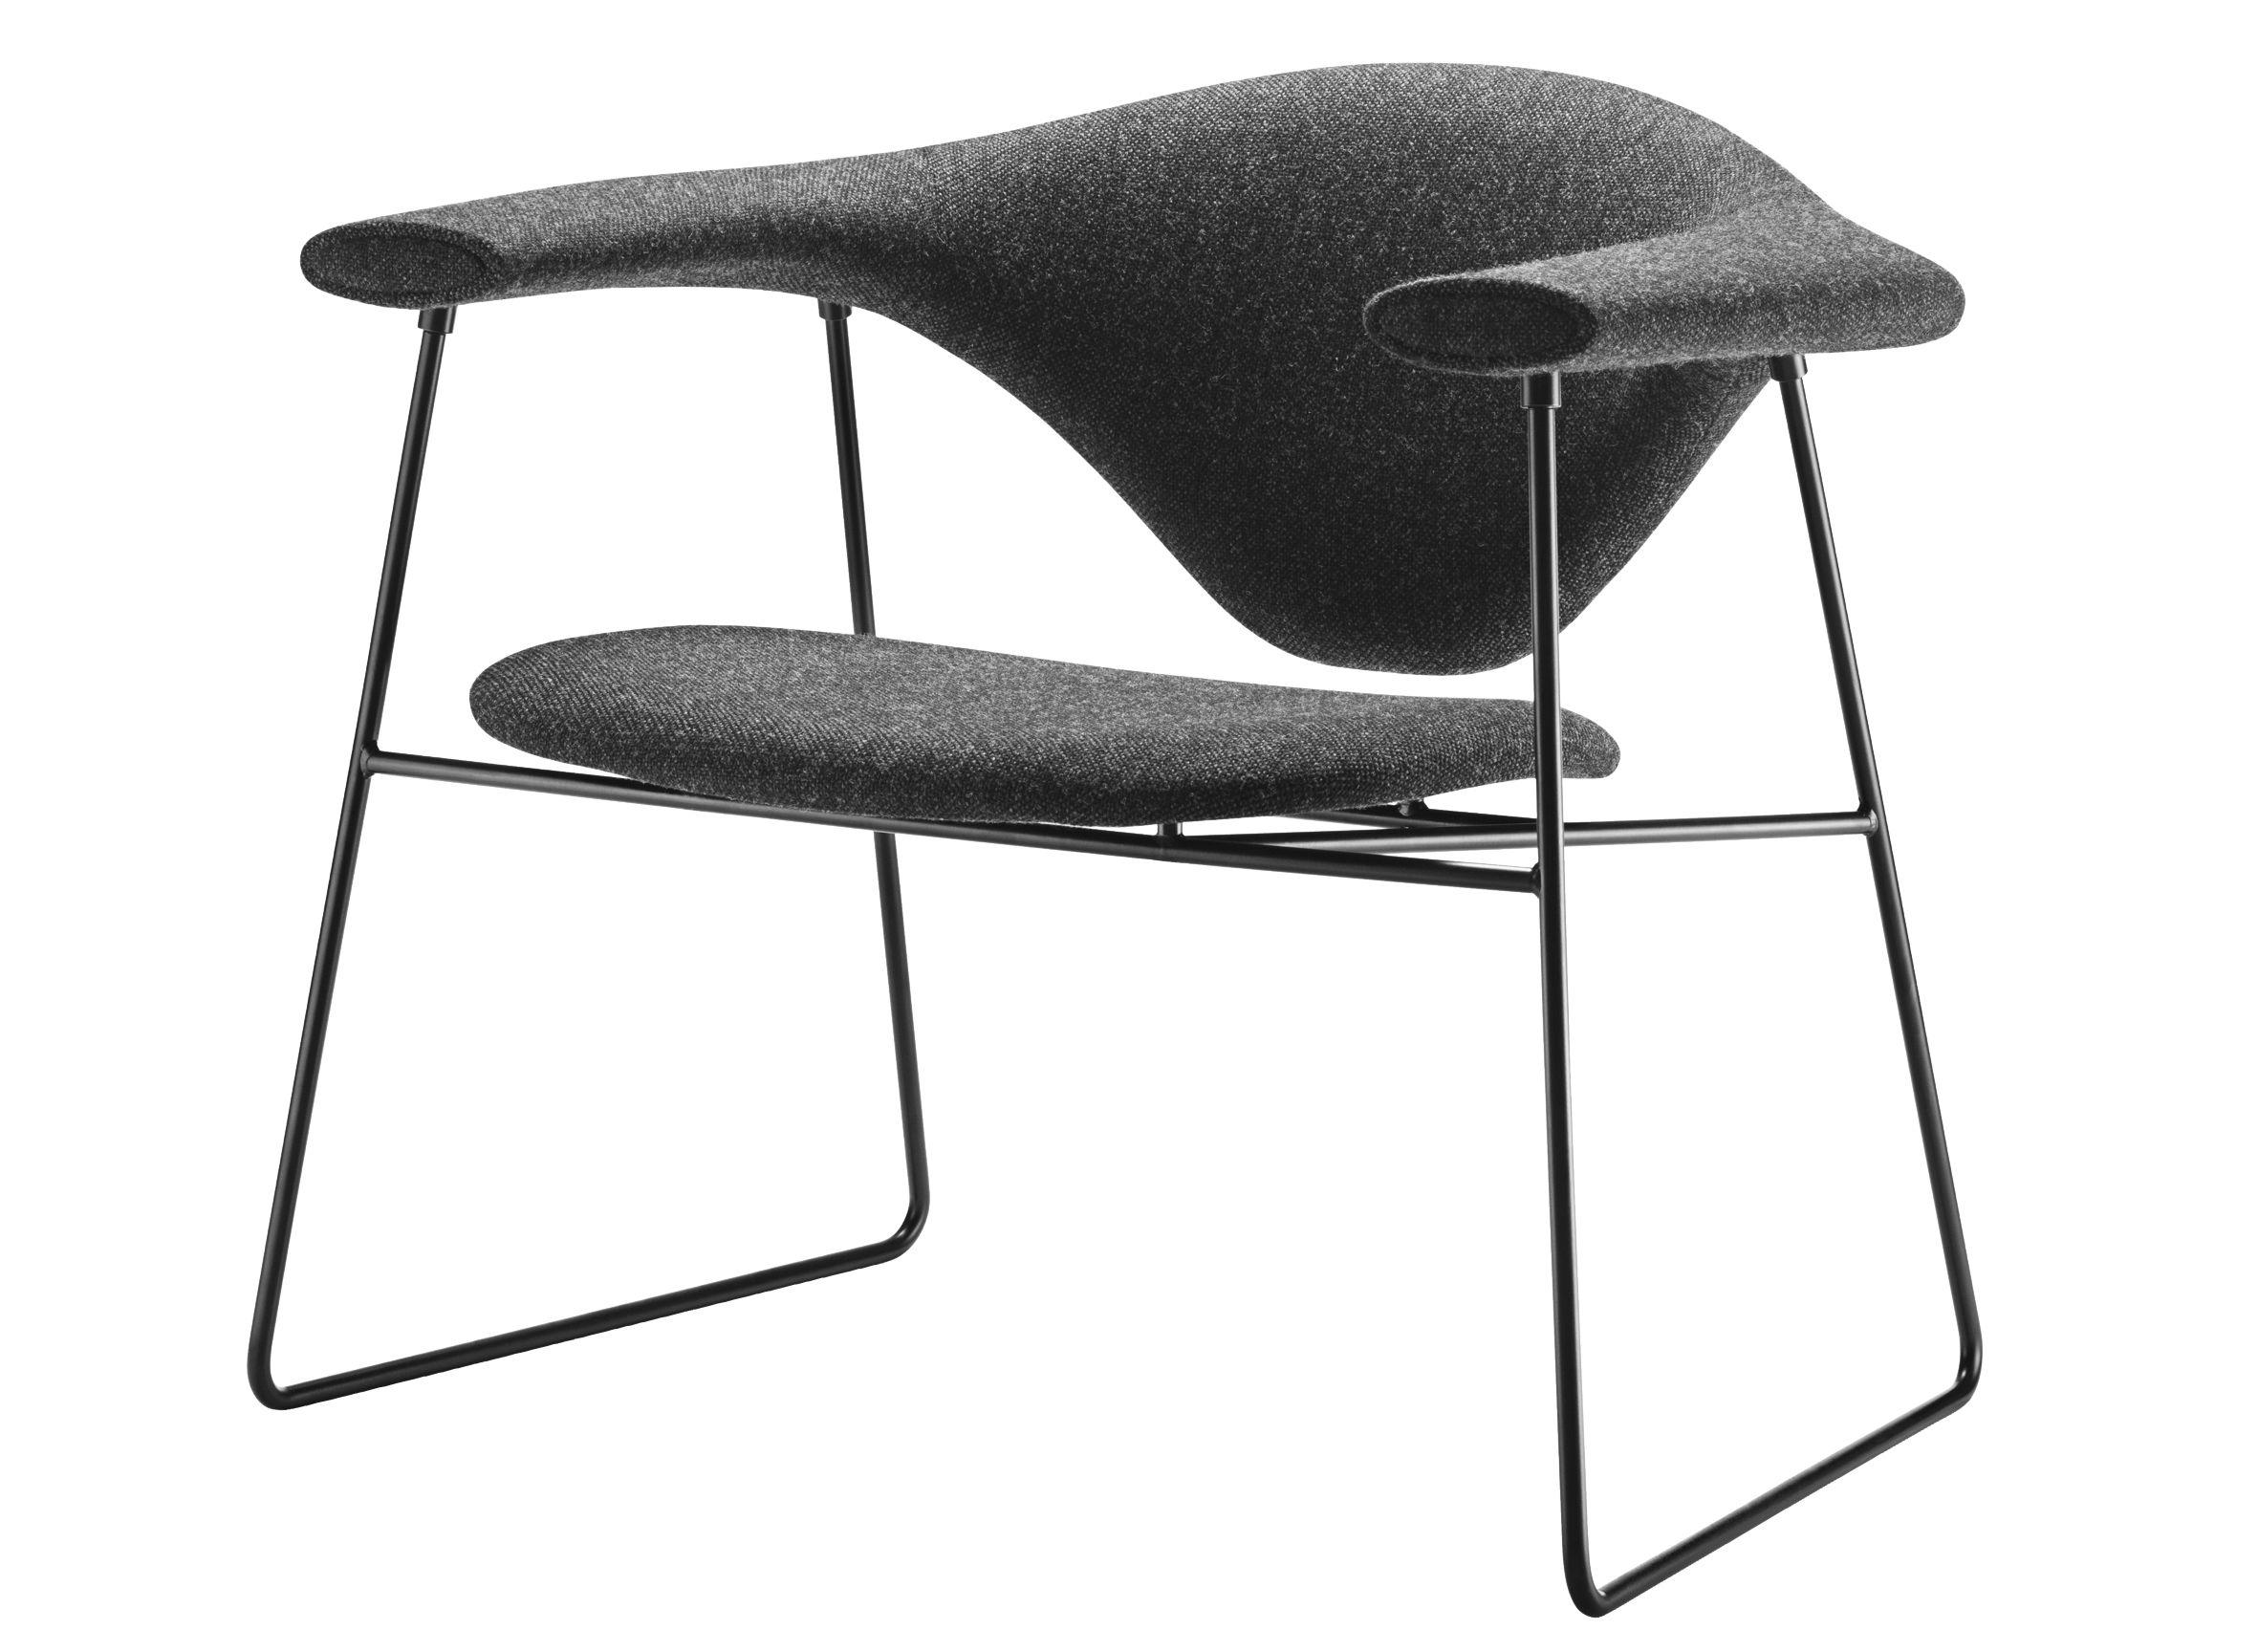 fauteuil bas masculo rembourr gris anthracite gubi made in design. Black Bedroom Furniture Sets. Home Design Ideas